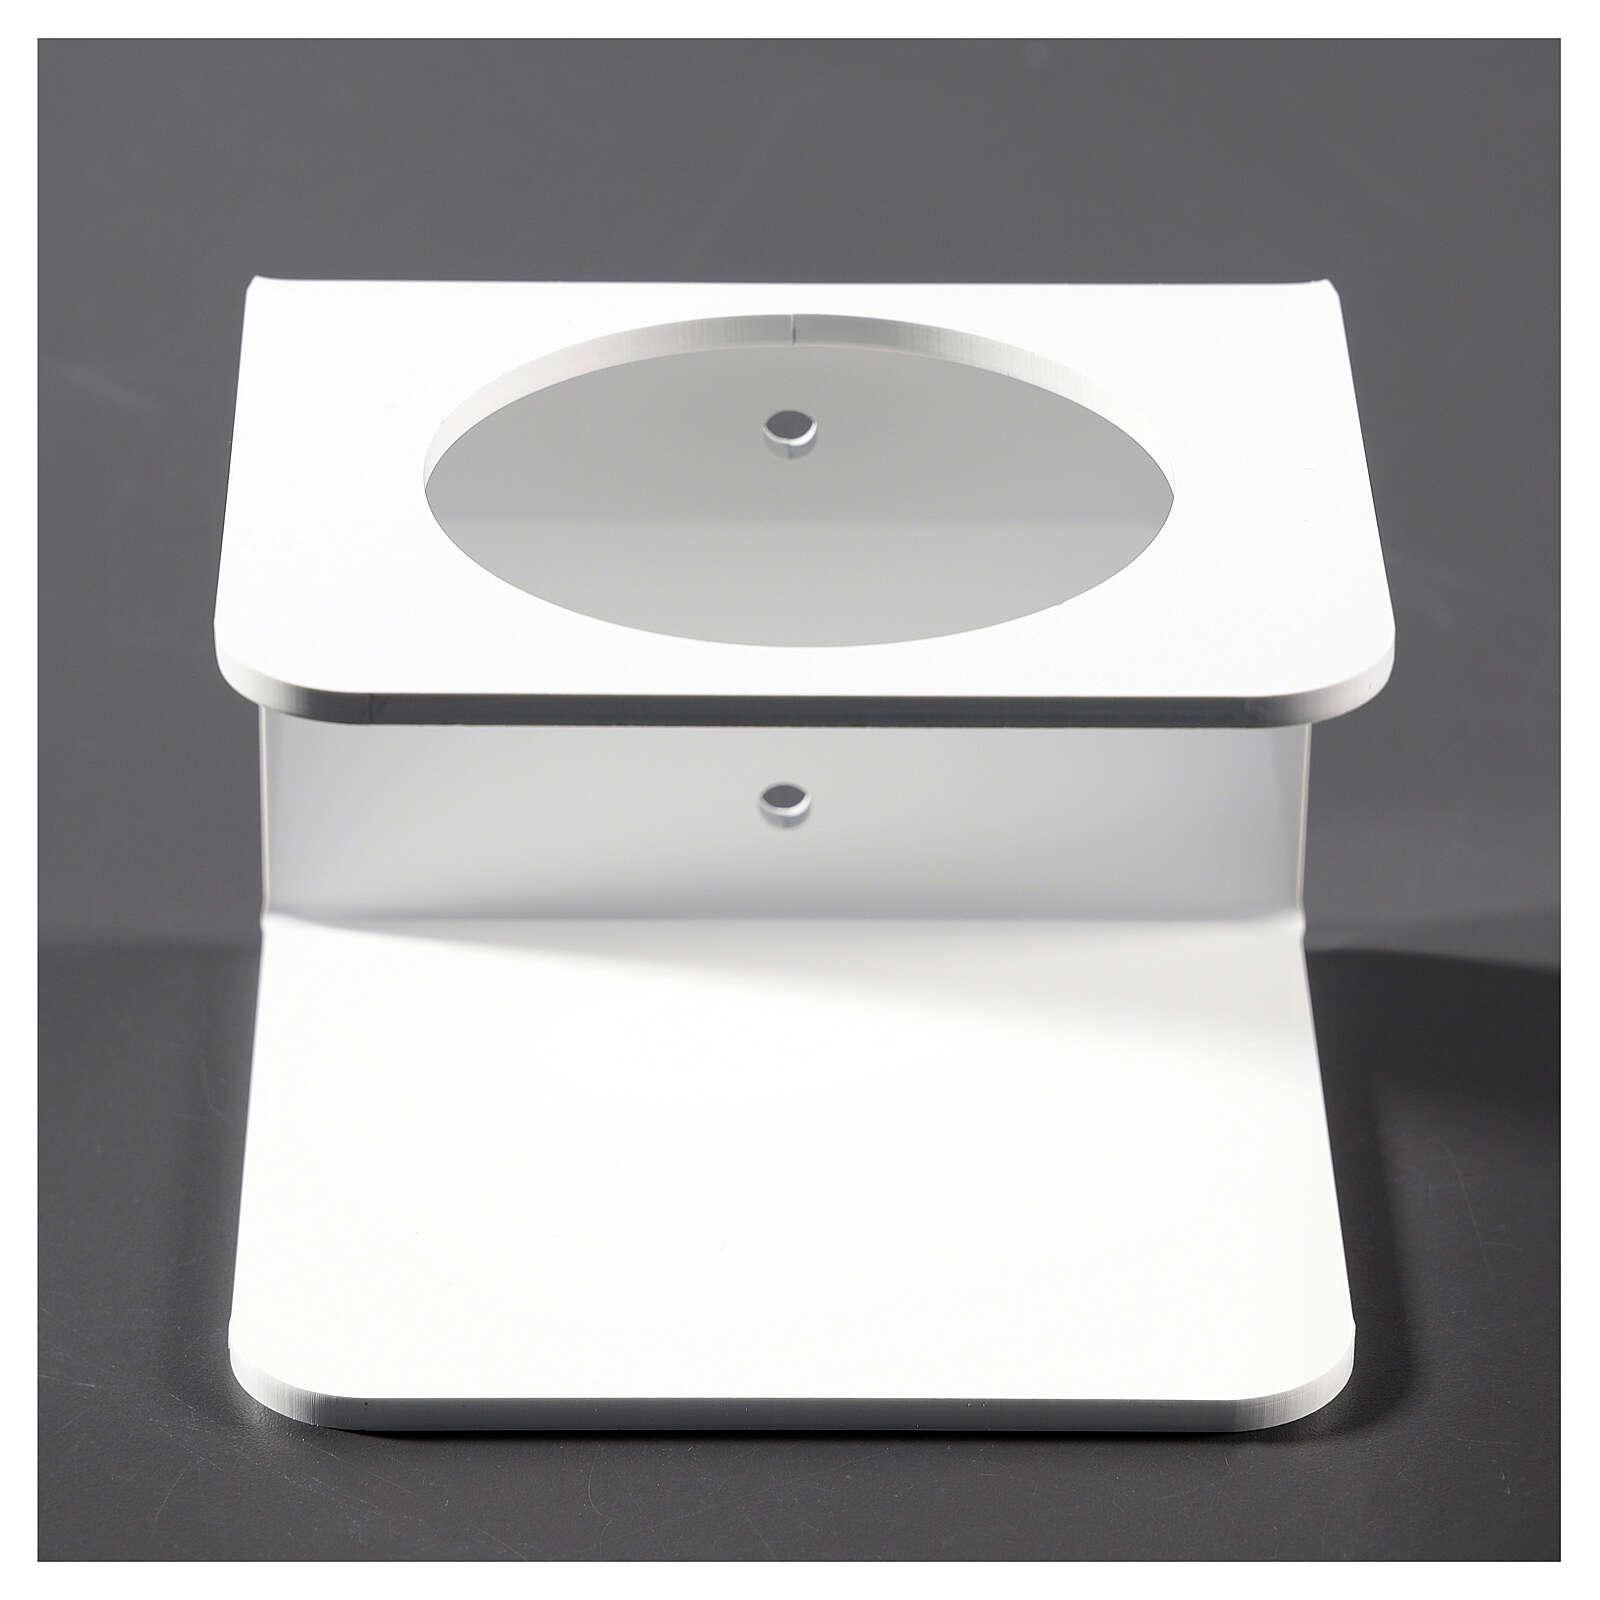 Plexiglas dispenser holder, wall mounted 3